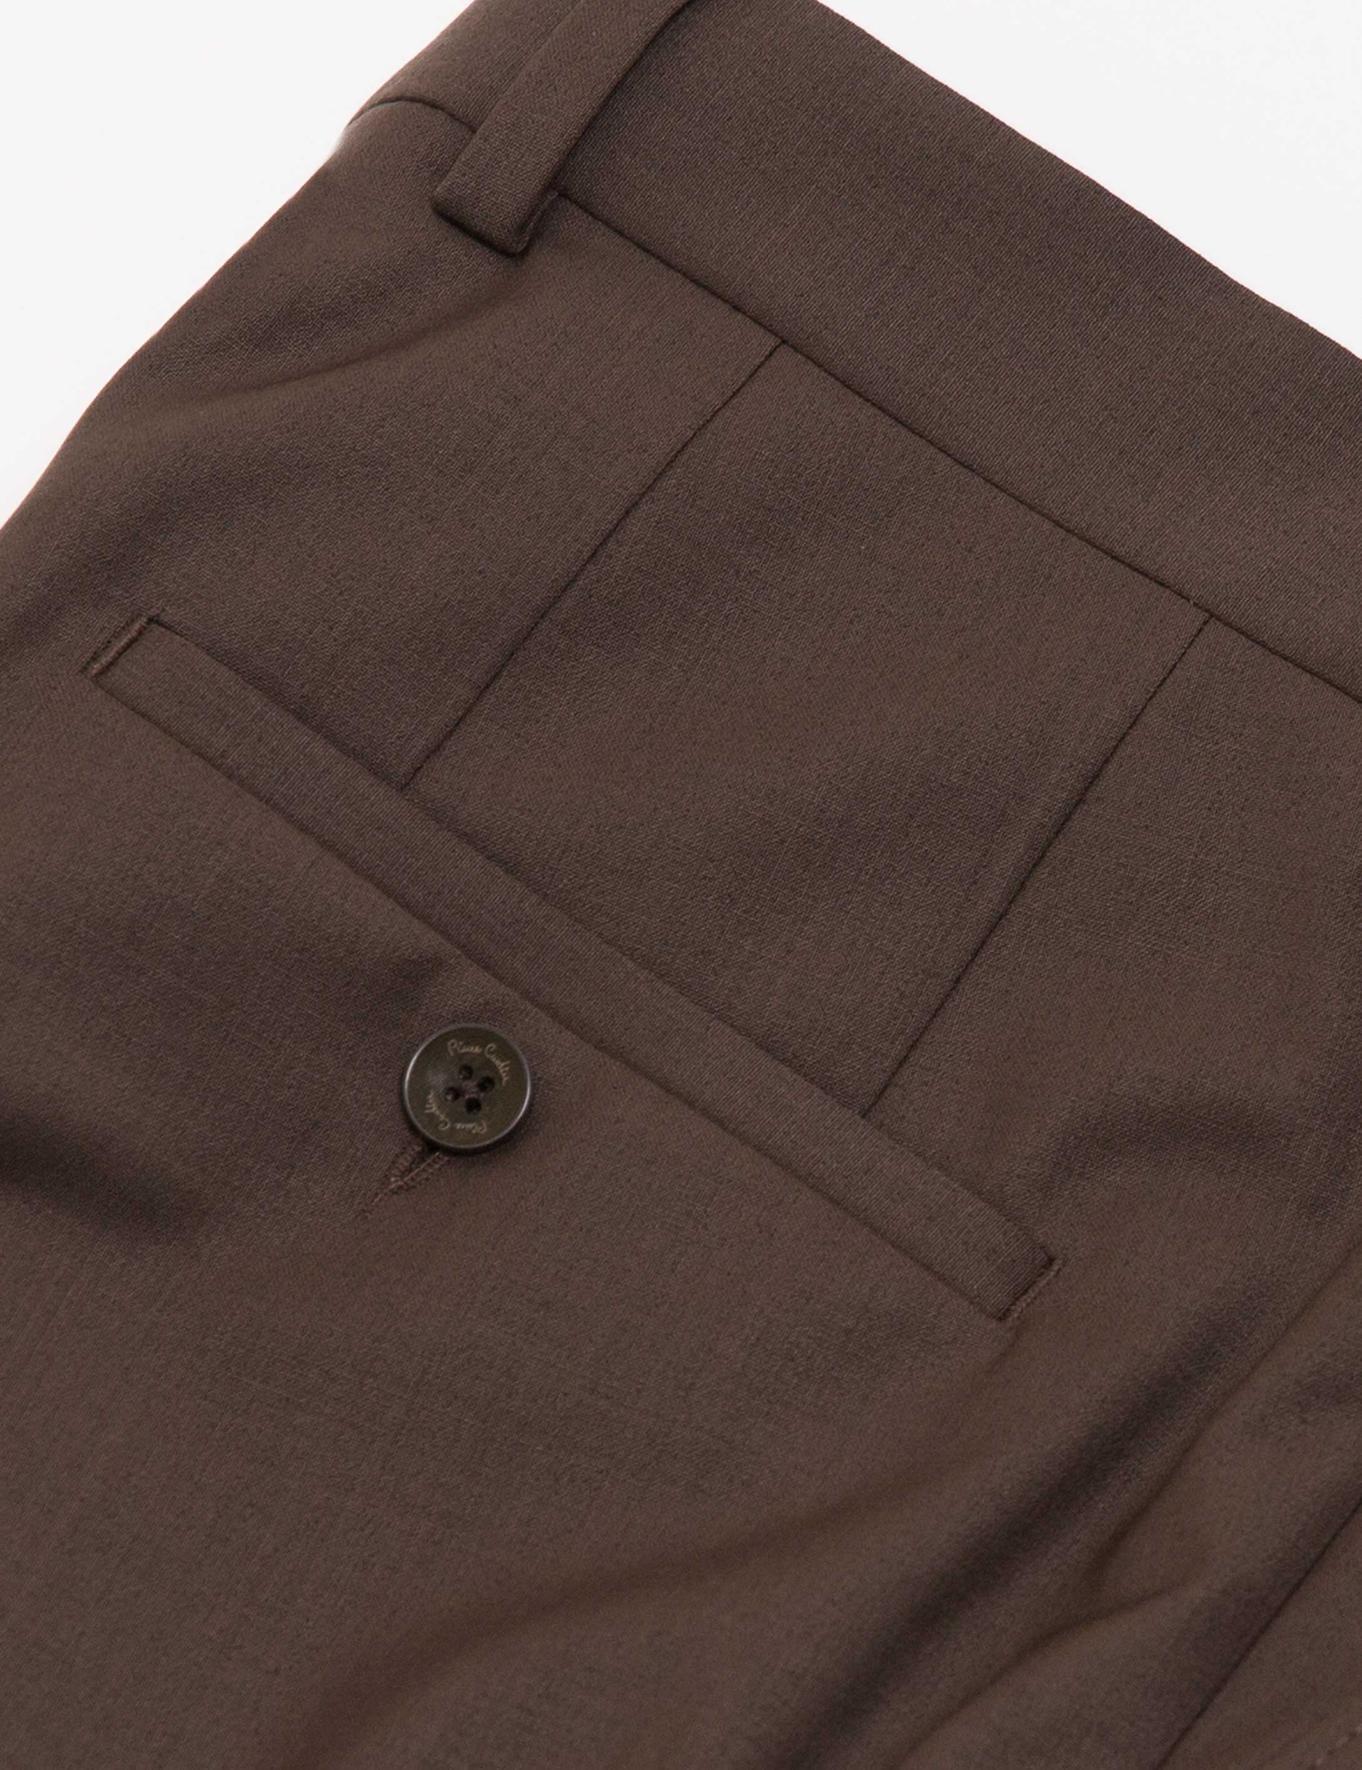 Açık Kahverengi Slim Fit Pantolon